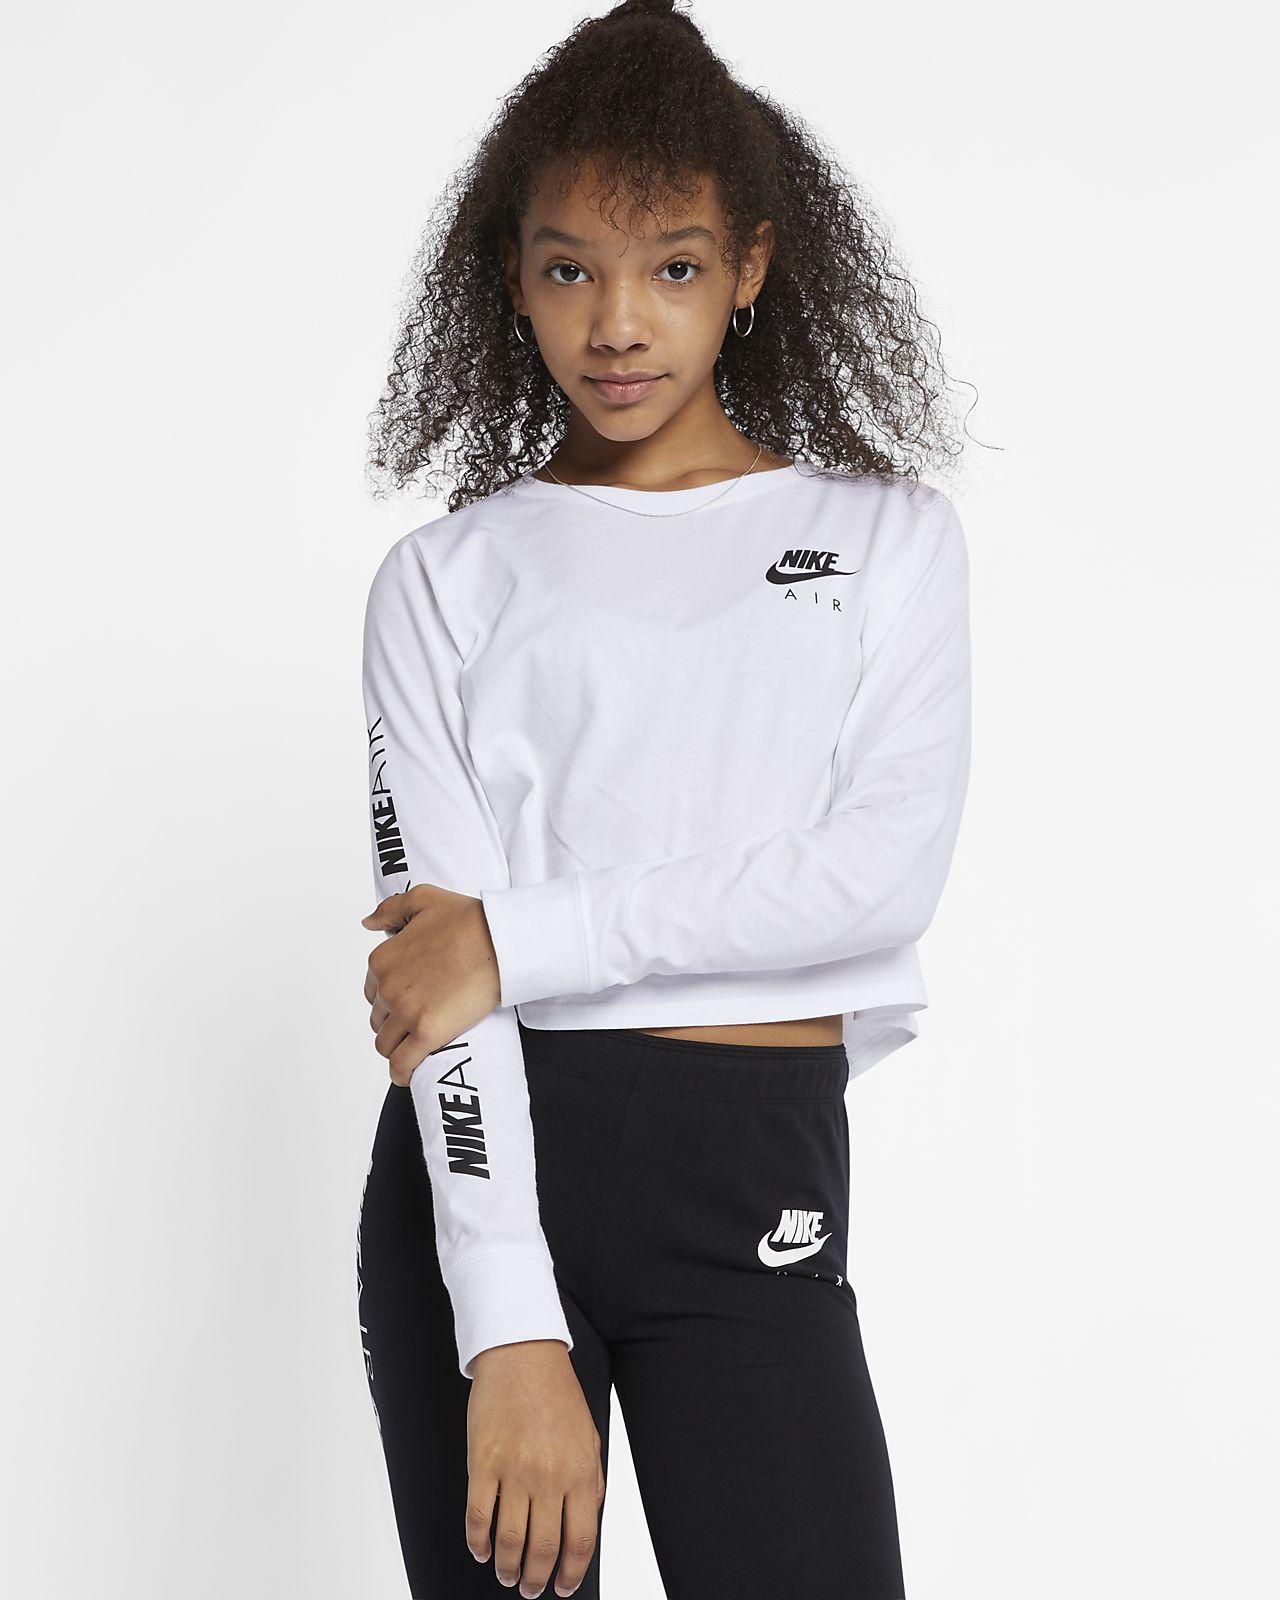 d358fd100a8cf5 Nike Air Big Kids  (Girls ) Long-Sleeve Crop Top. Nike.com